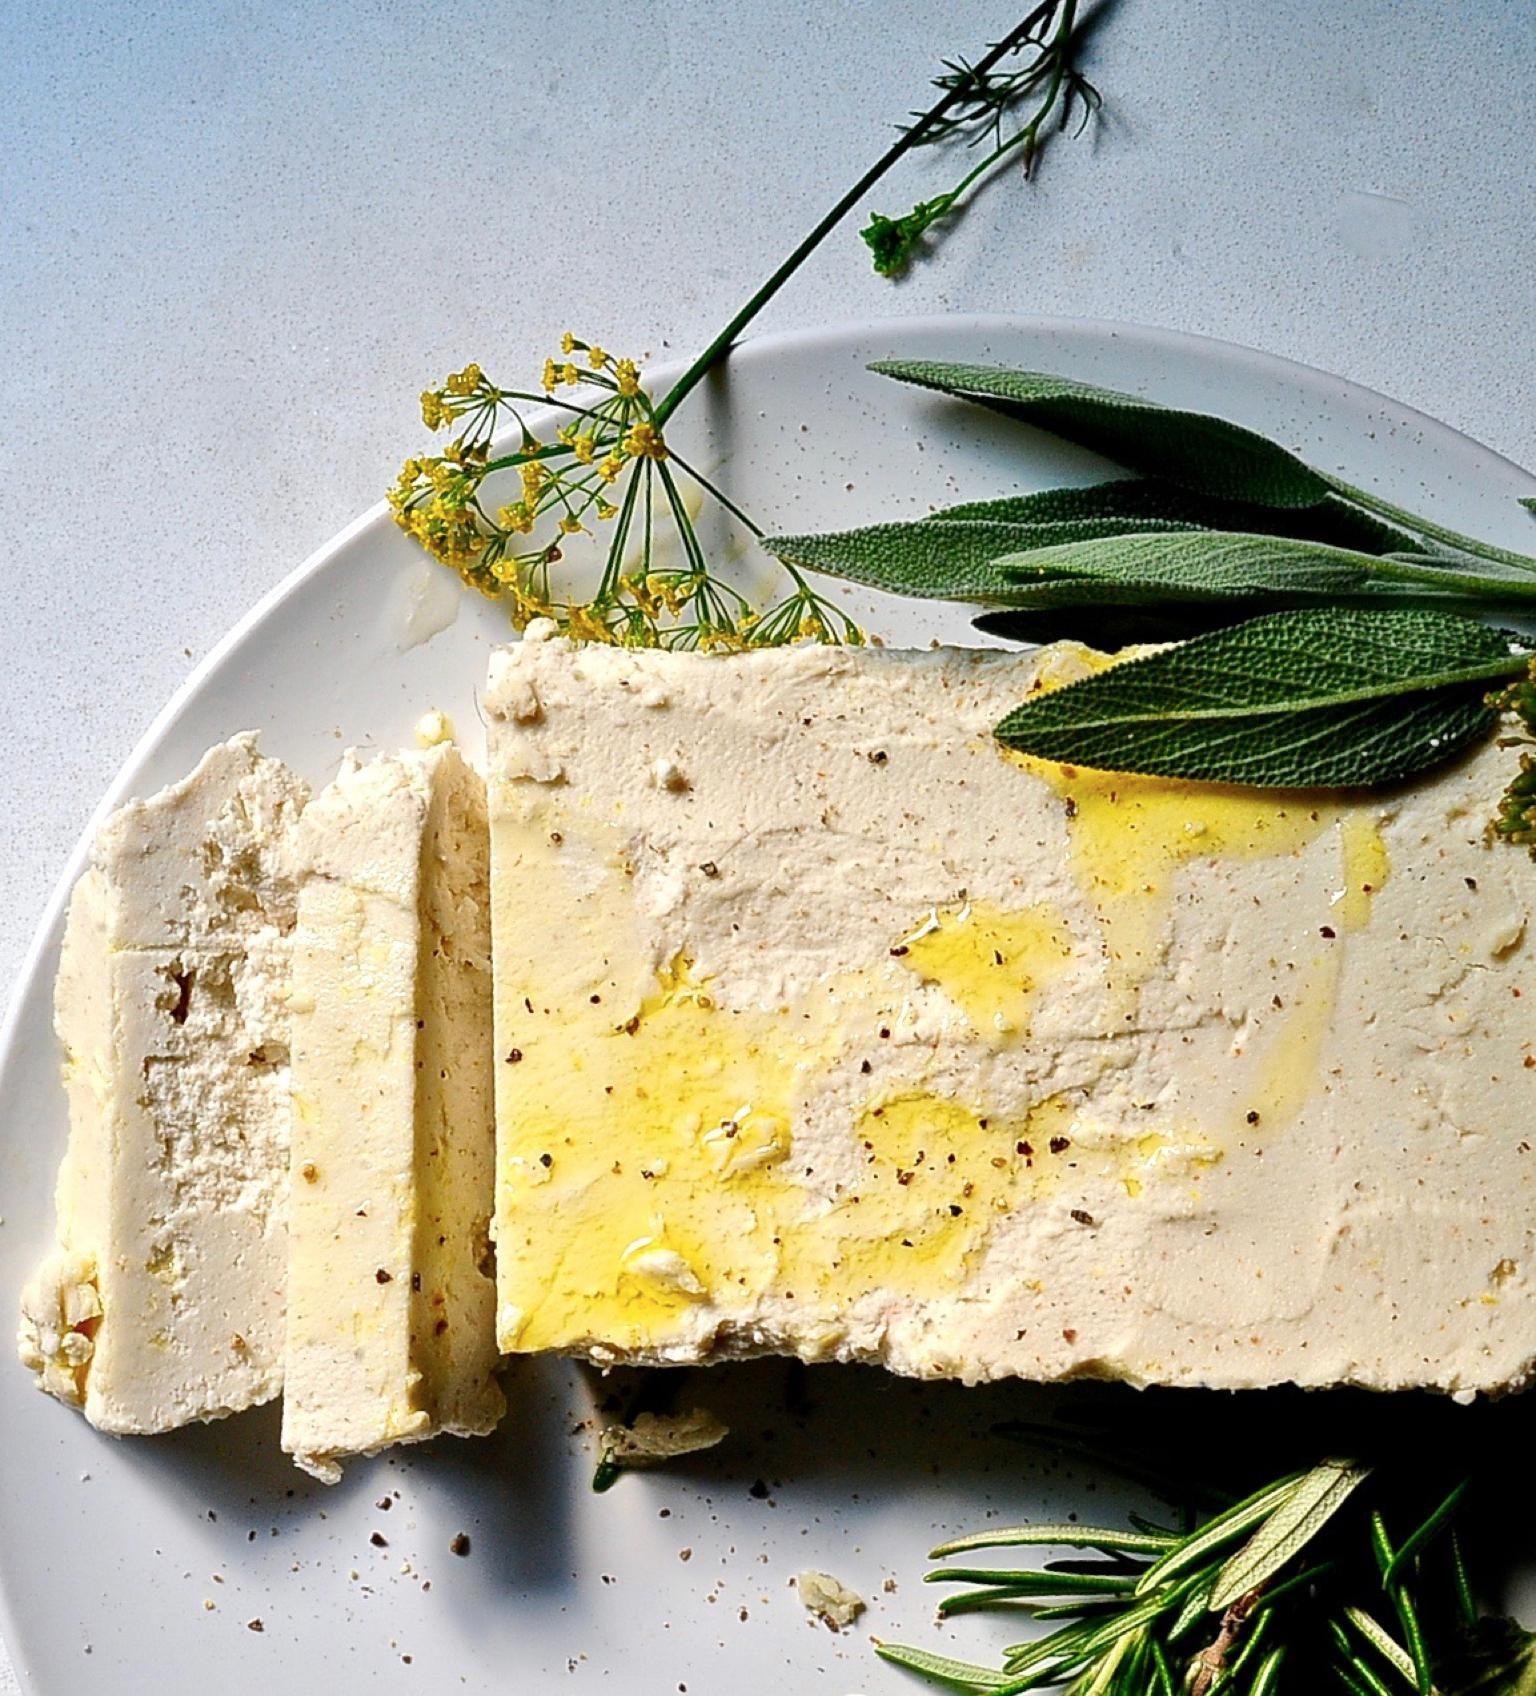 Herb Marinated Almond Feta Vegan Recipe Vegan Cheese Feta